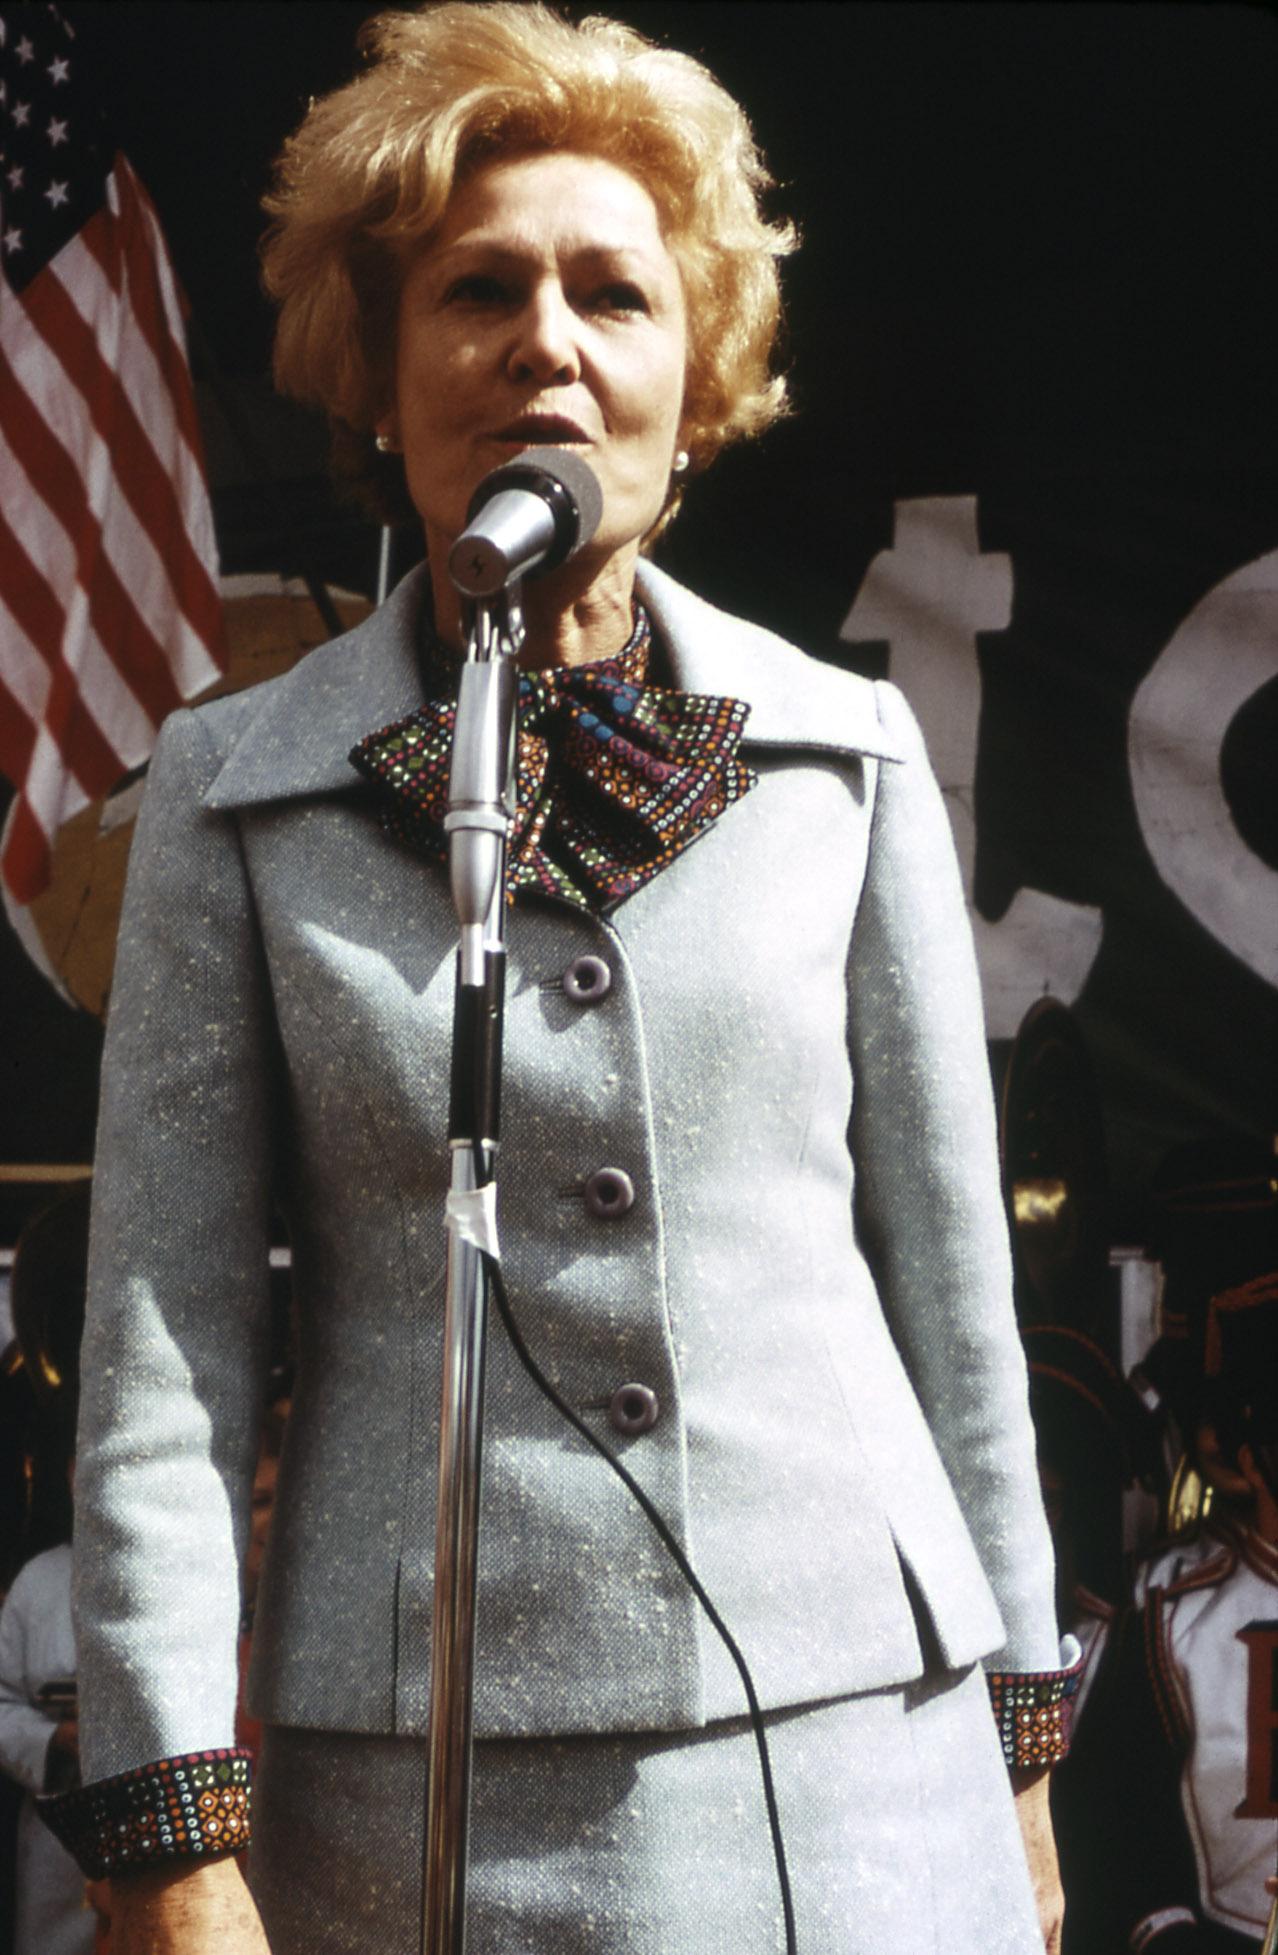 https://upload.wikimedia.org/wikipedia/commons/a/a4/Pat_Nixon_speaks_1972.jpg